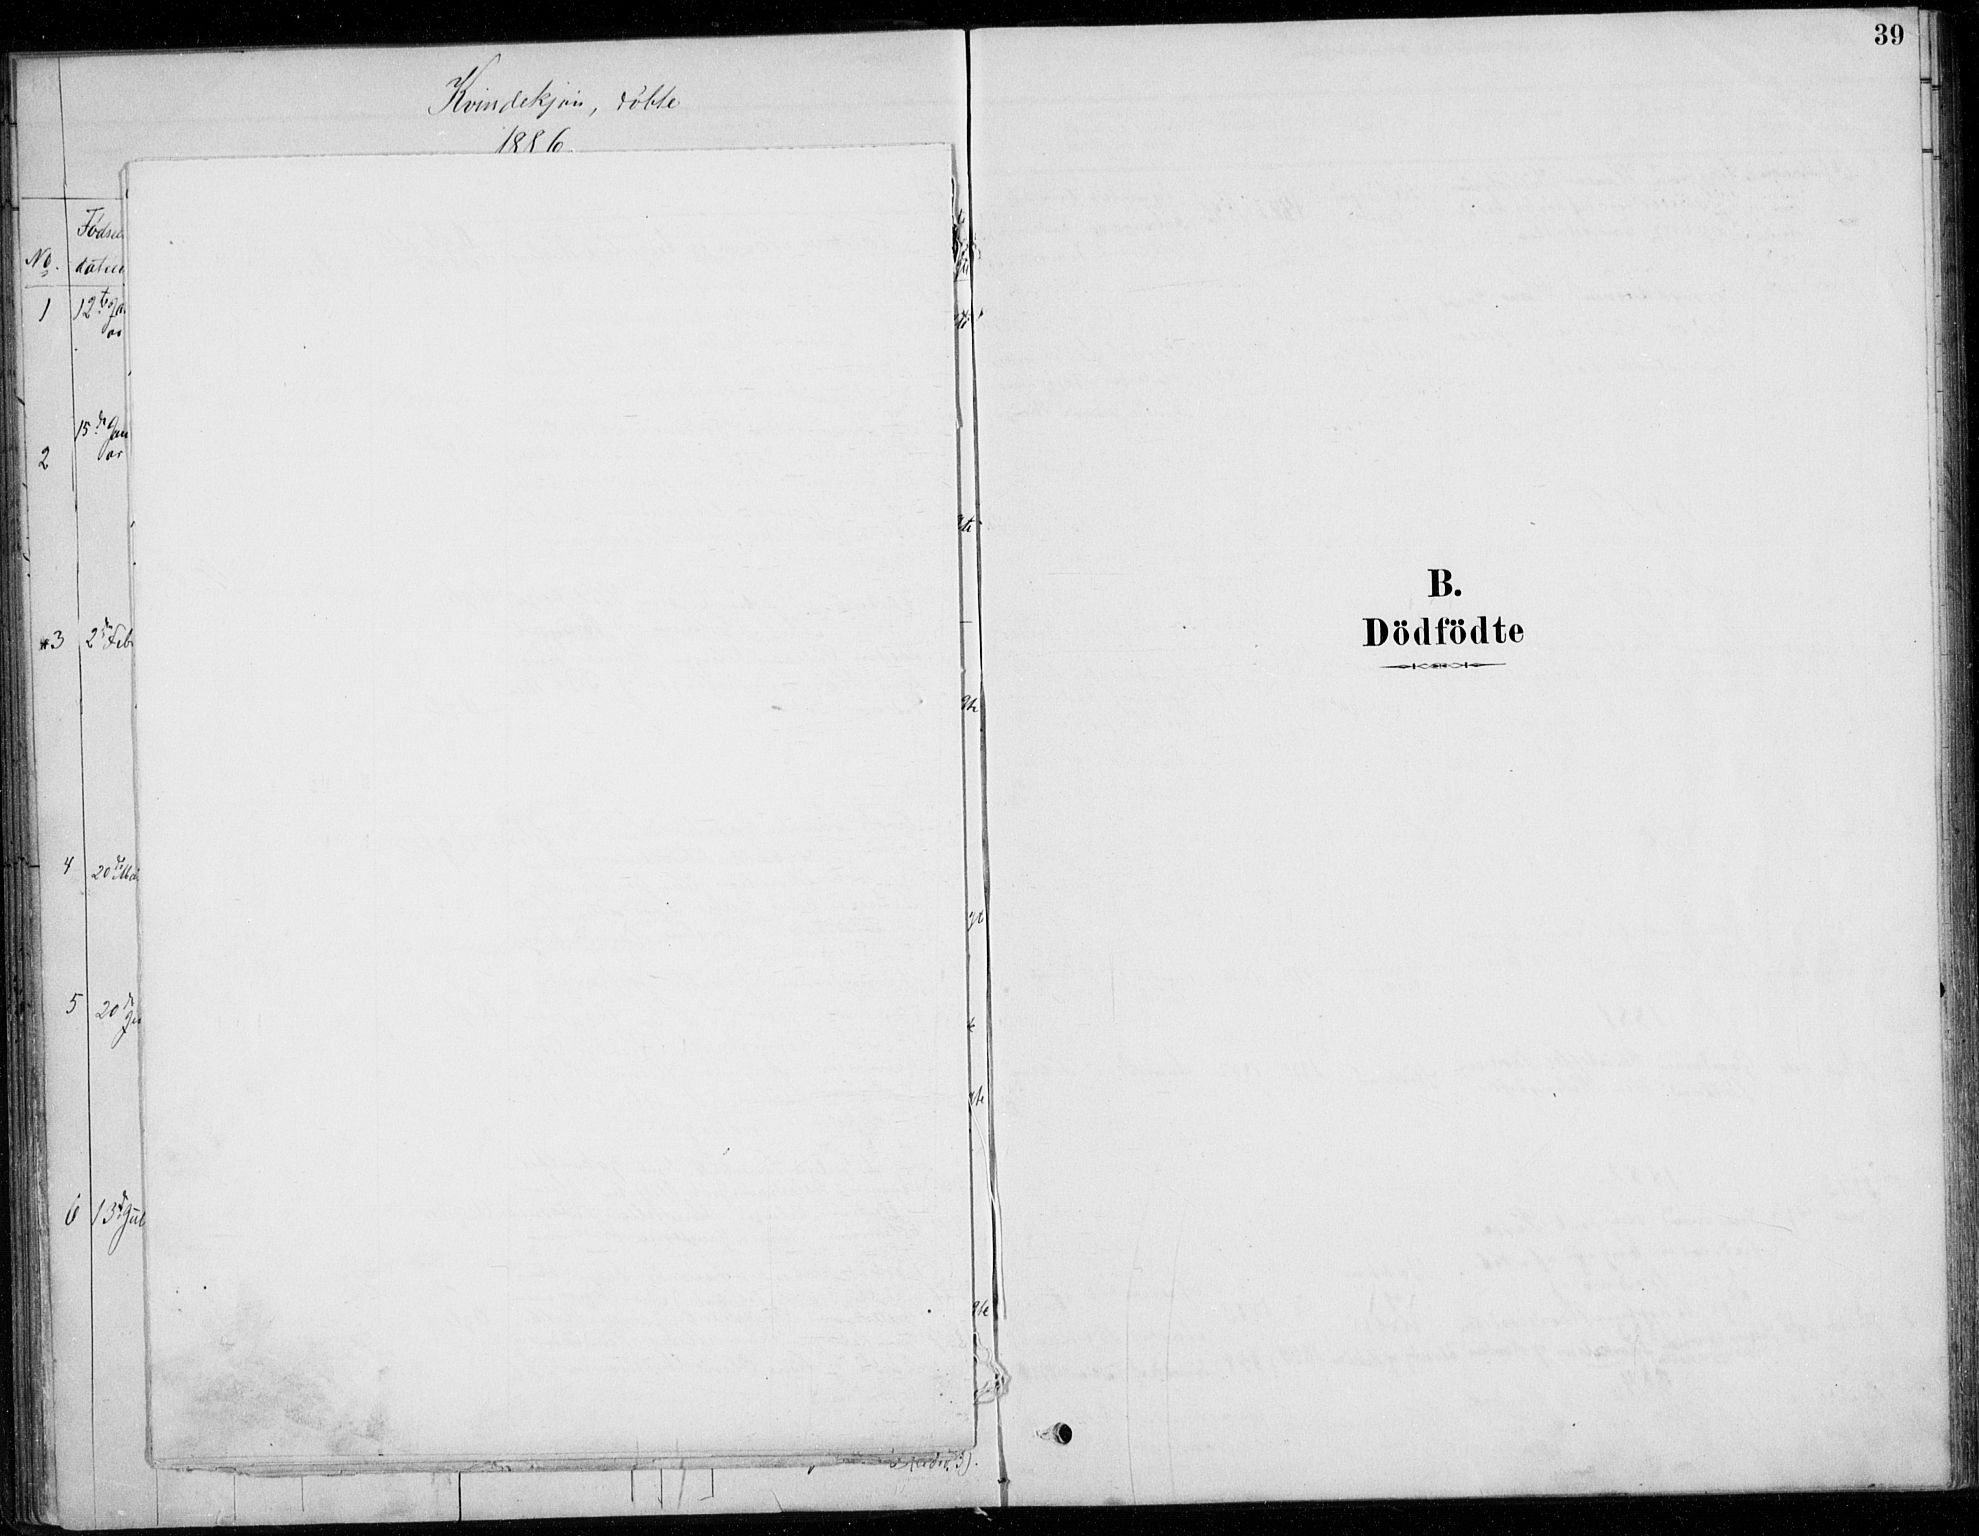 SAO, Fet prestekontor Kirkebøker, G/Gb/L0002: Klokkerbok nr. II 2, 1878-1911, s. 39